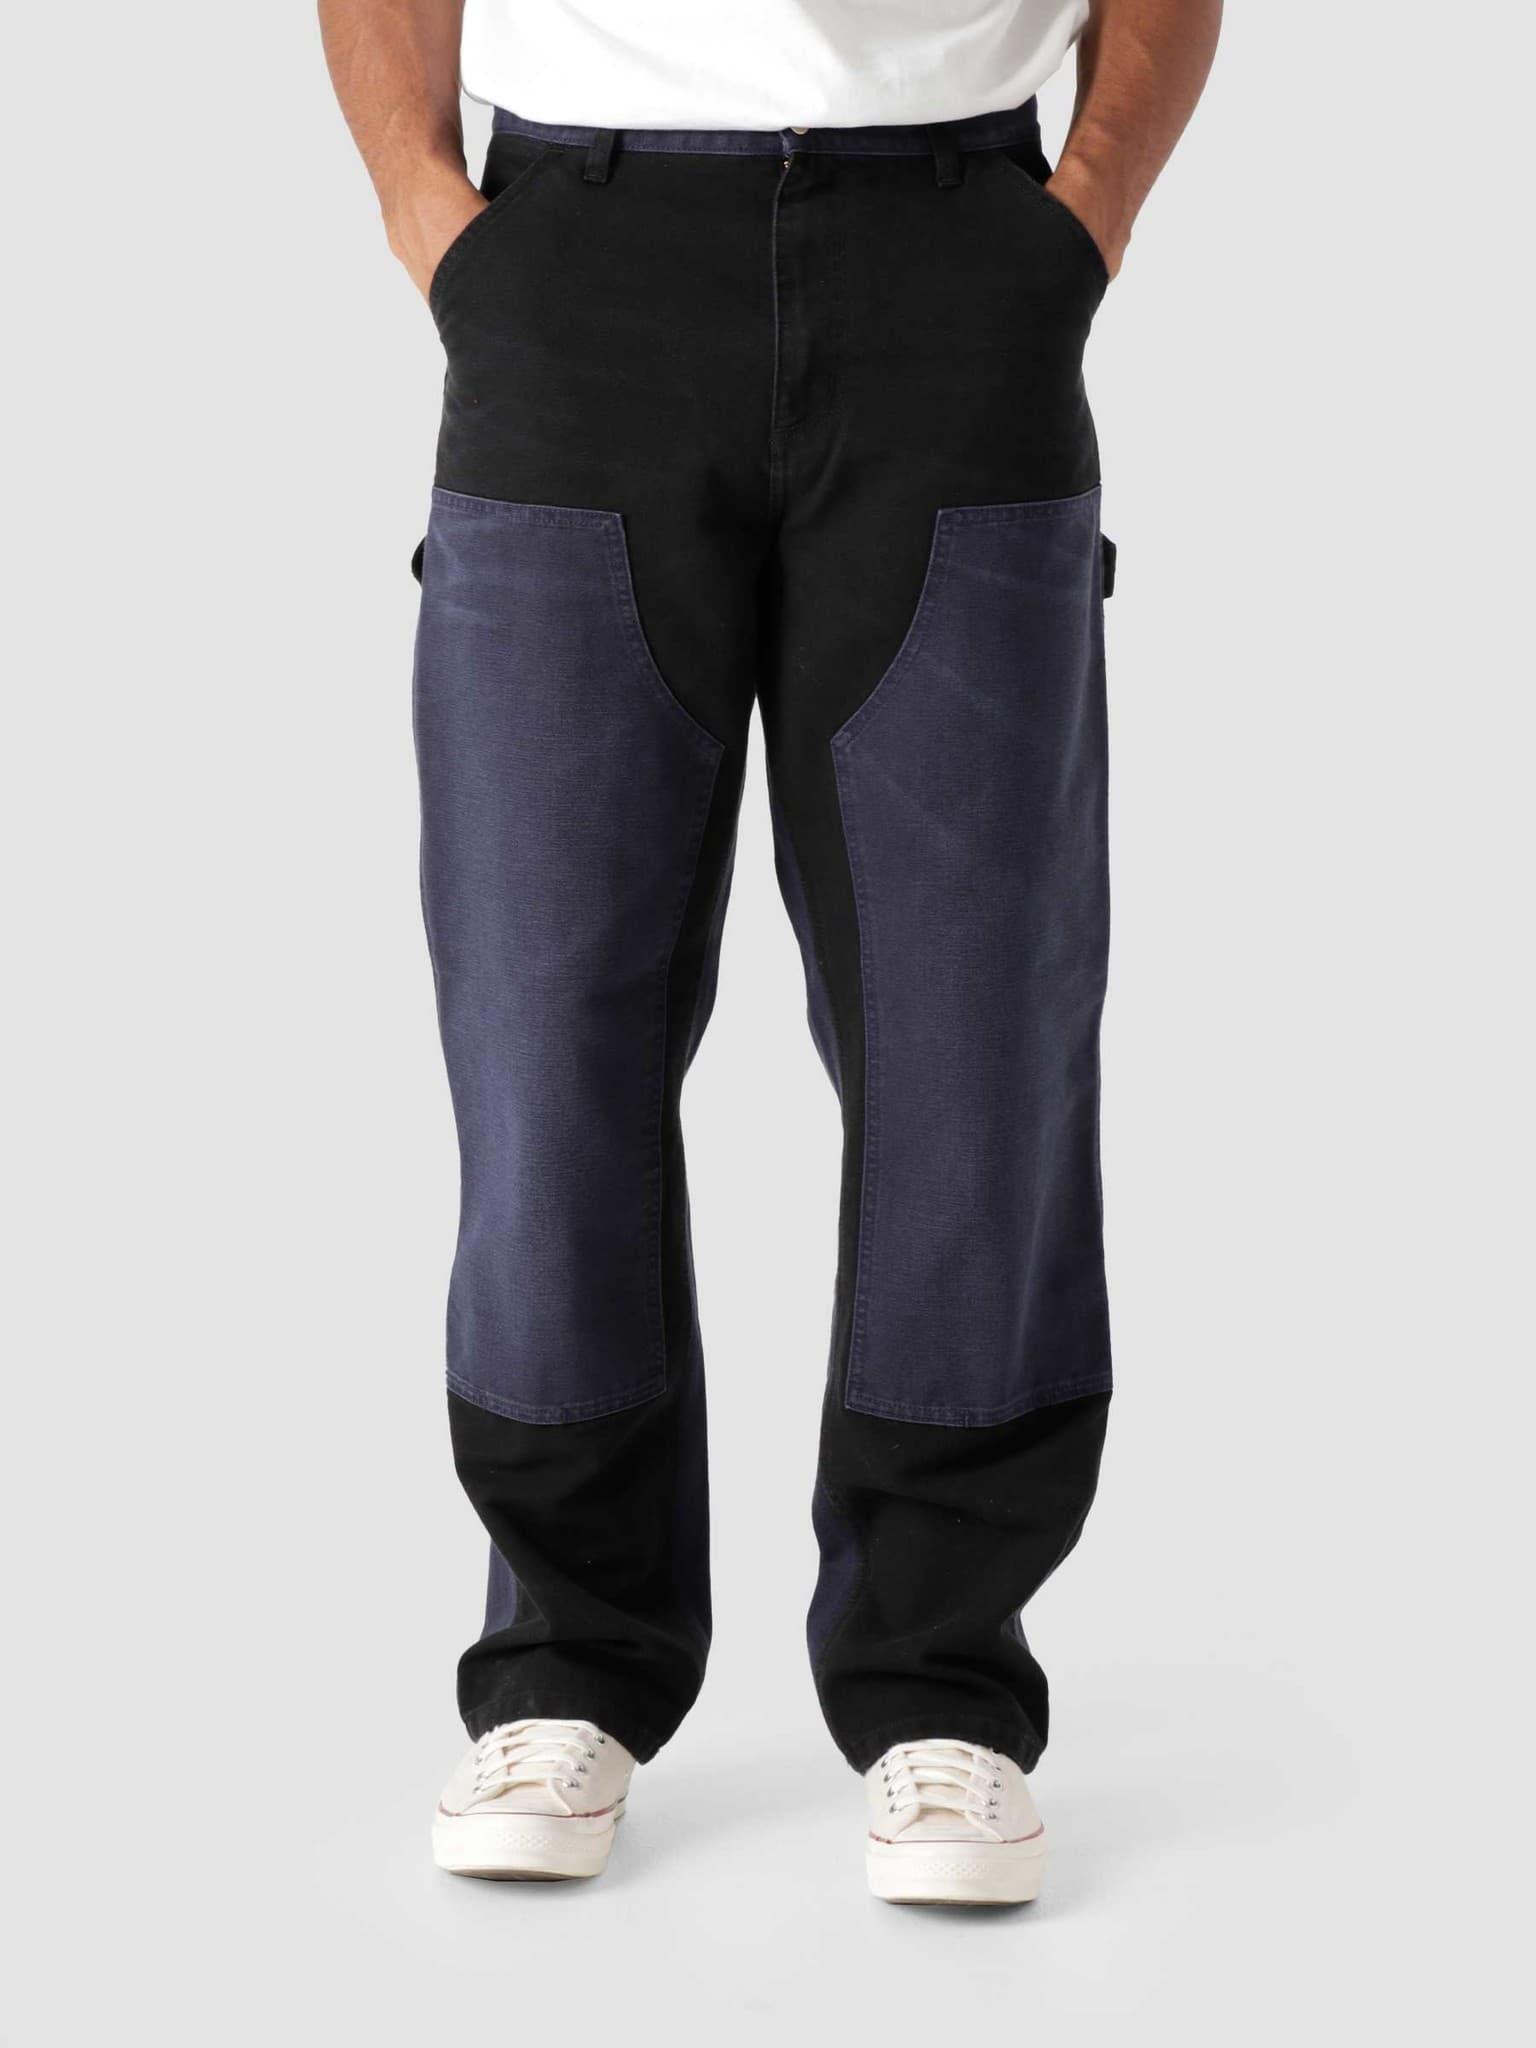 Double Knee Pant Black Dark Navy Aged Canvas I029780-0IE3K